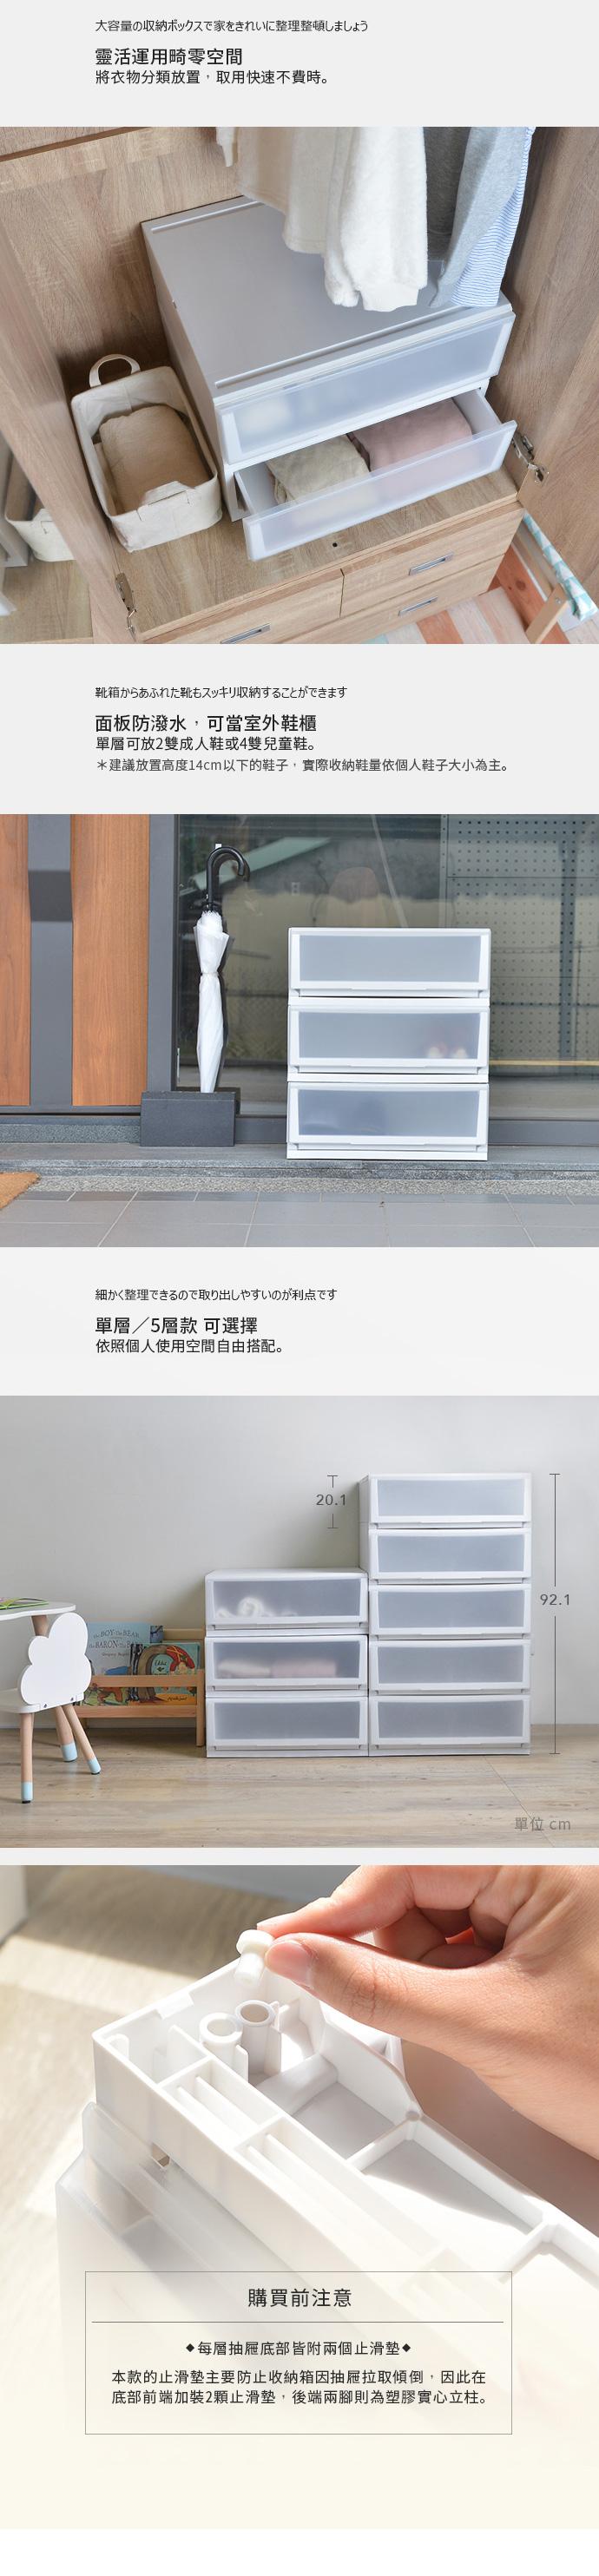 +O家窩 日本製 悠納霧透PP單層抽屜收納箱-DIY-32L-3入